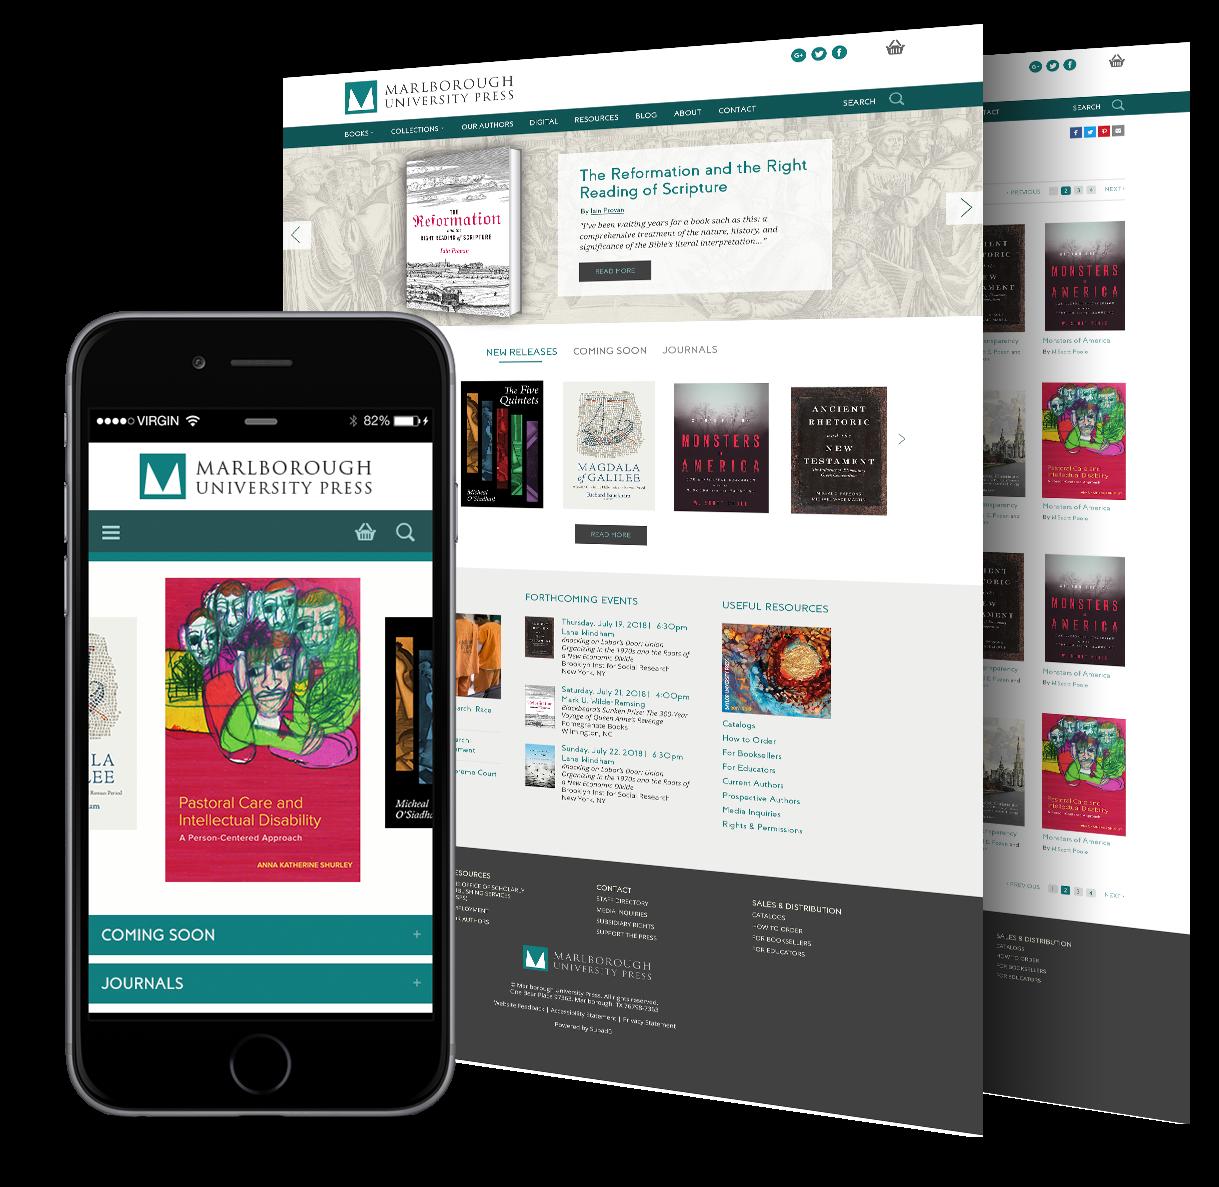 SupaCart Professional - Supadu ecommerce solutions for publishers & university presses